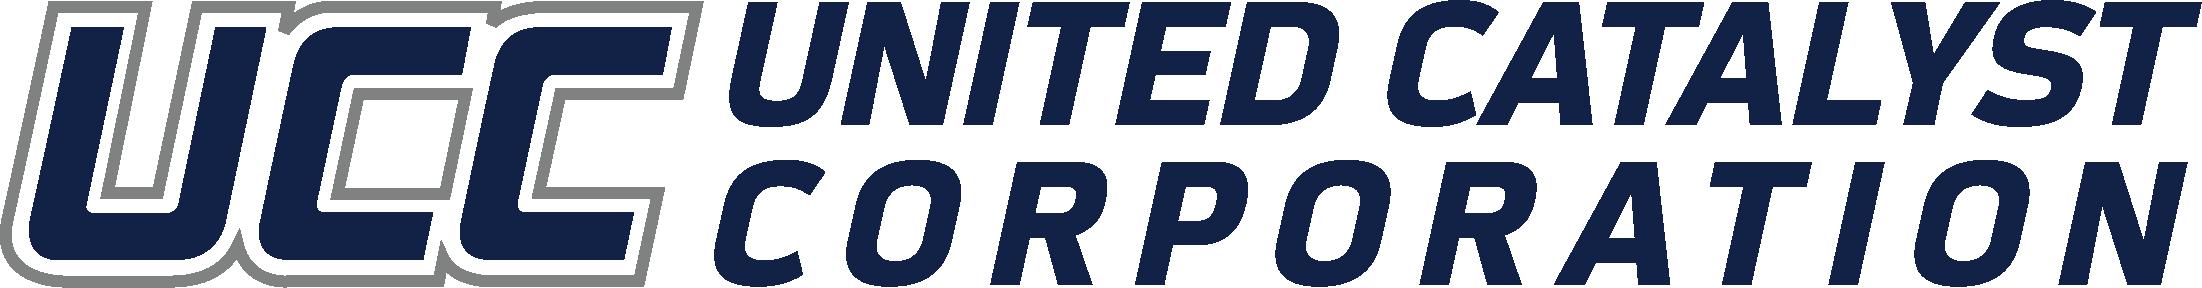 United Catalyst Corporation